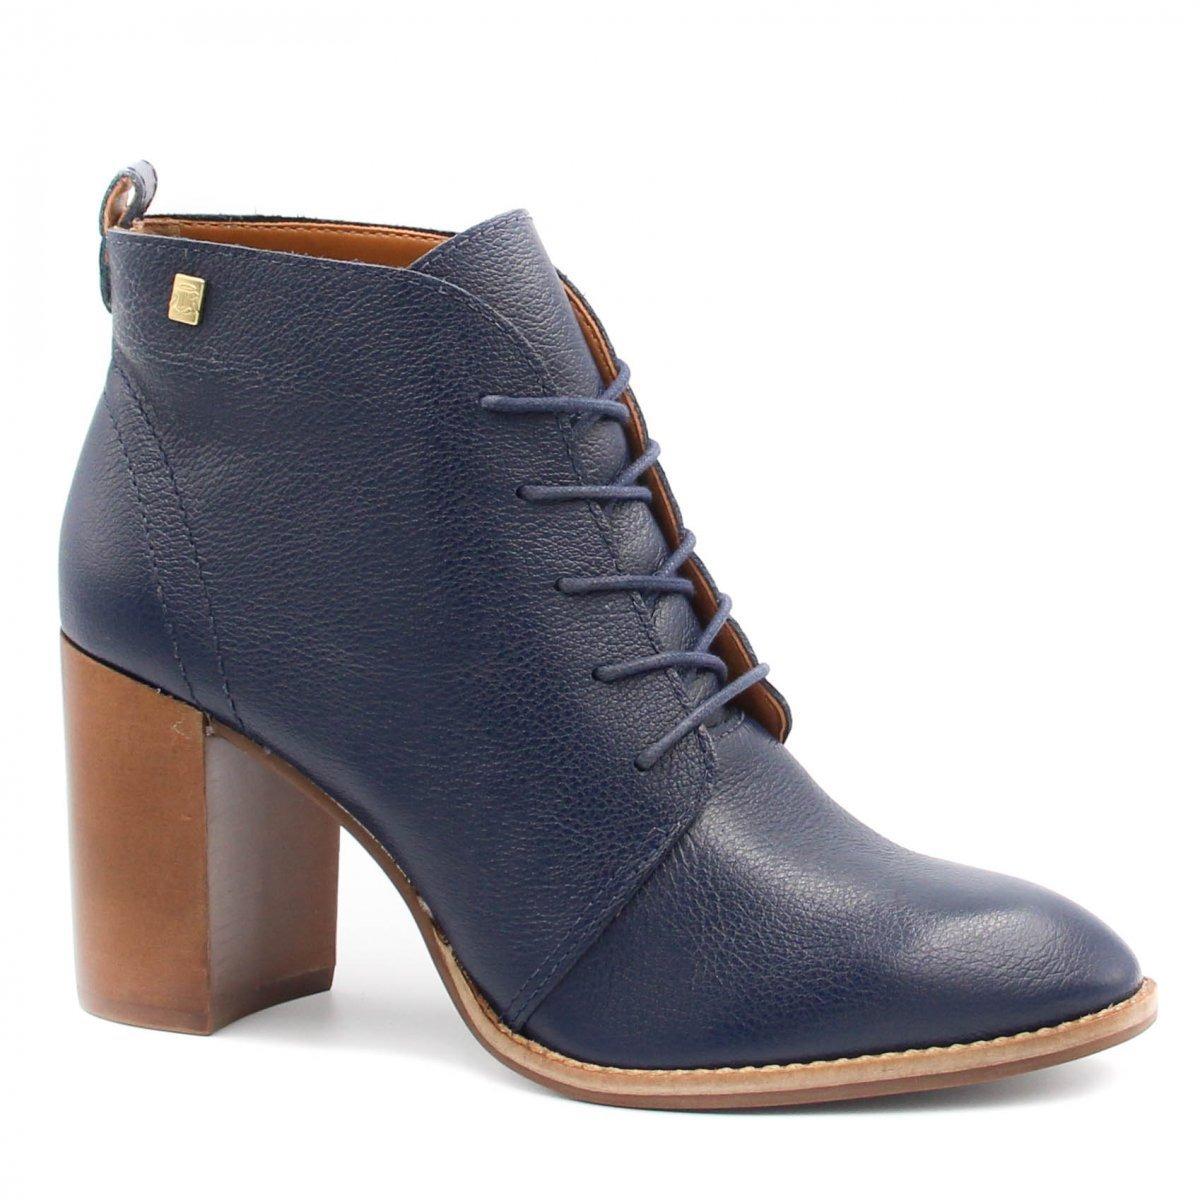 11996118352f2 Bota Feminina Coturno Loucos E Santos Ankle Boot